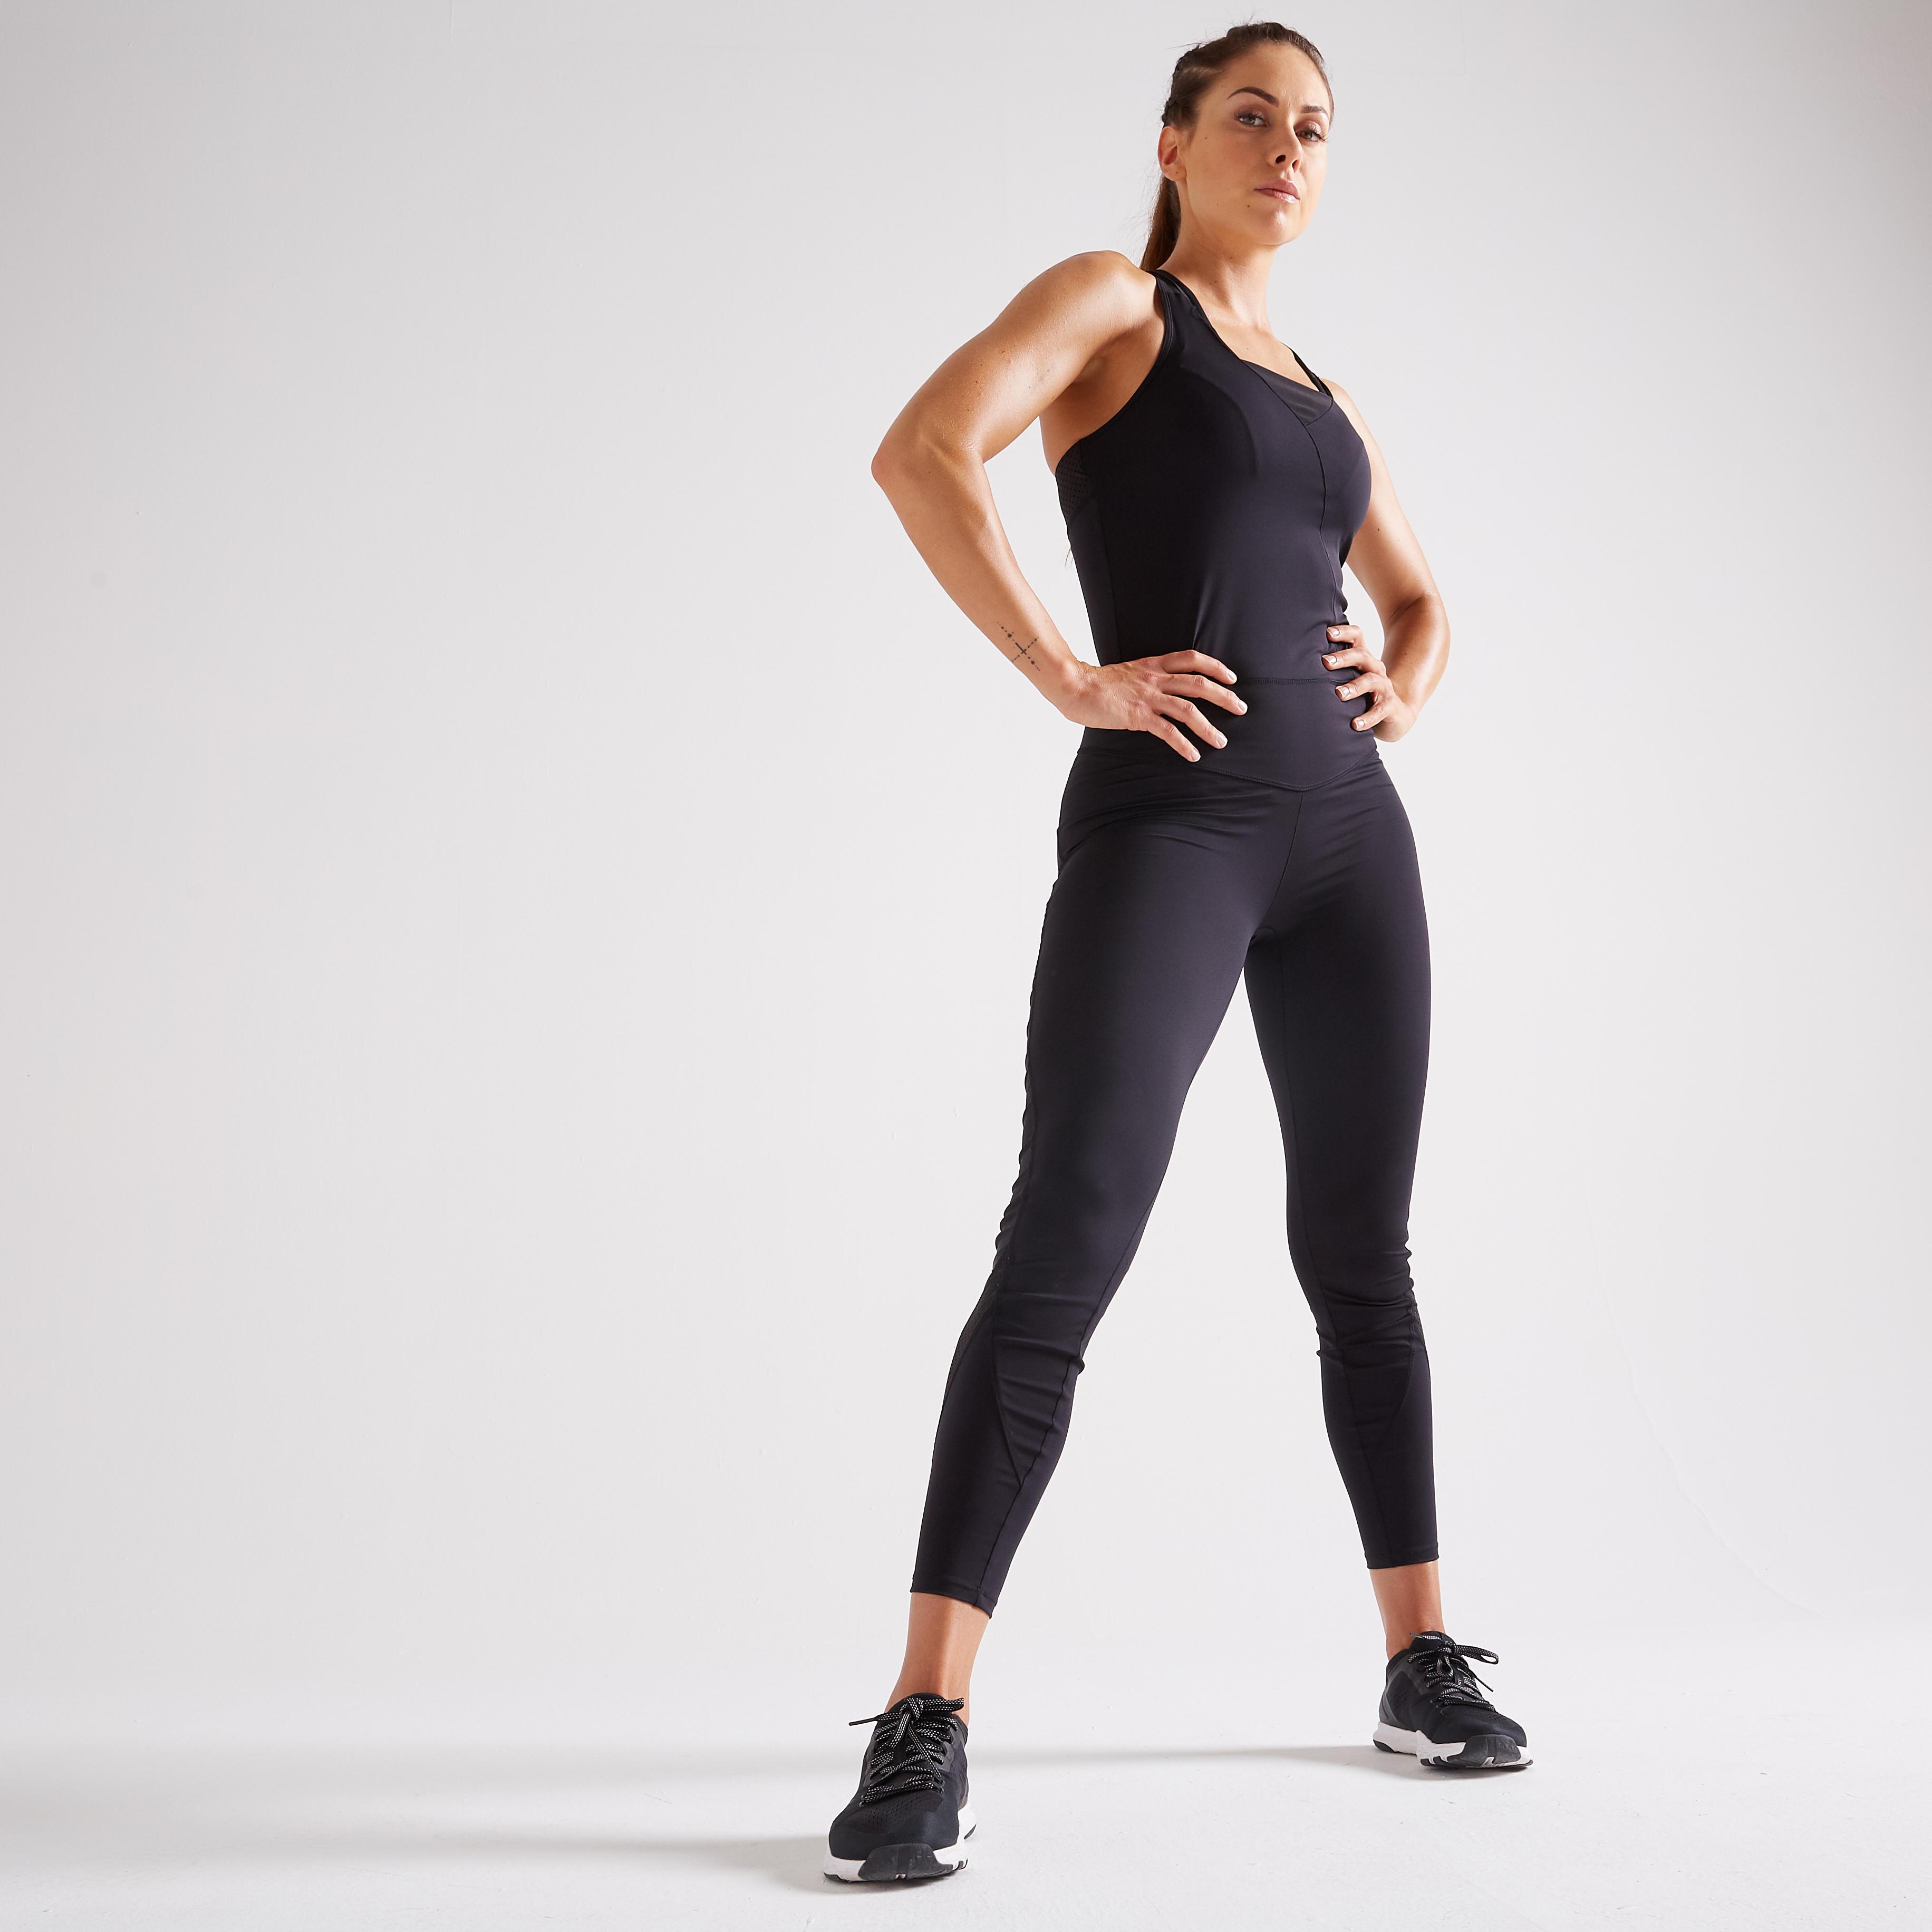 b2e82f186bfc Mono fitness cardio-training mujer negro 900